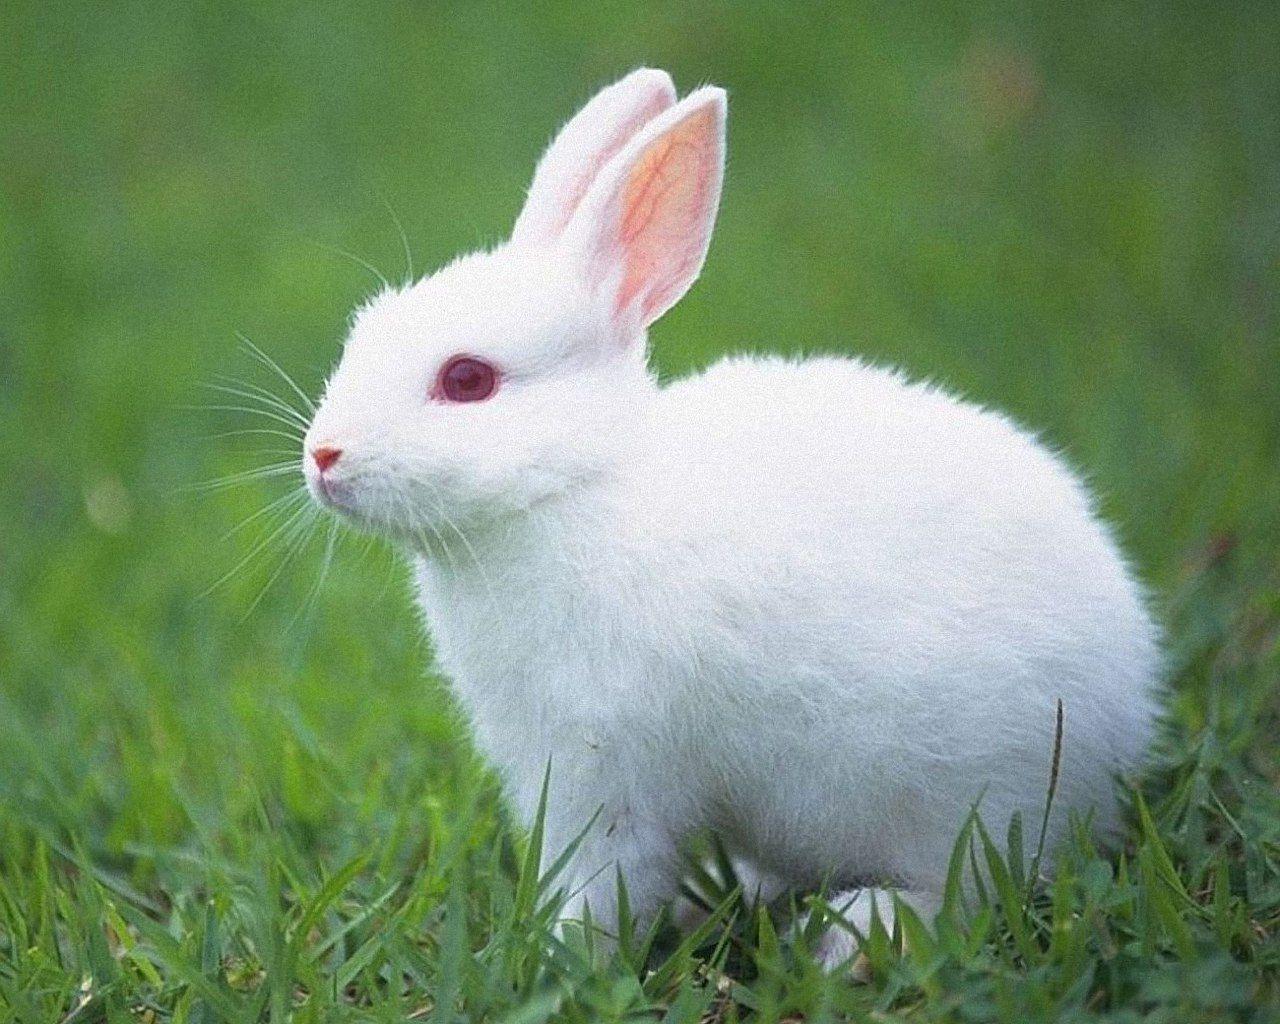 Cute White Rabbits Wallpaper 2139 1280x1024 Rabbit Wallpaper Animals Cute Baby Animals